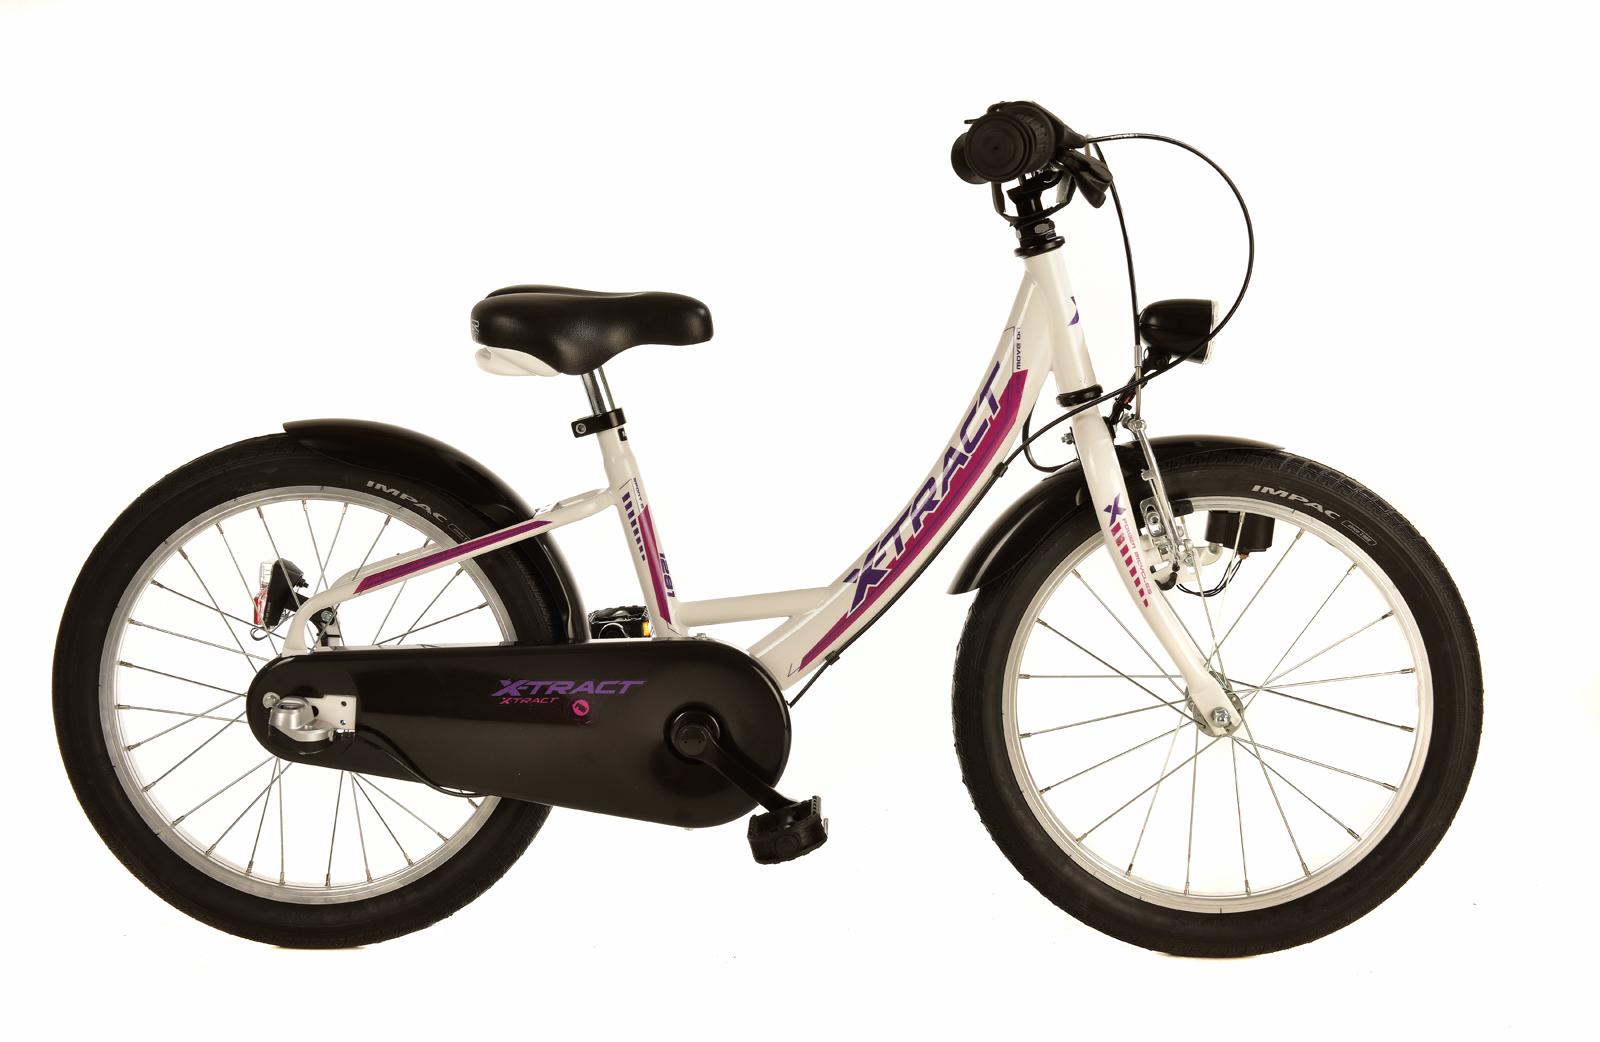 X Tract 1281 Feldmeier Bikes